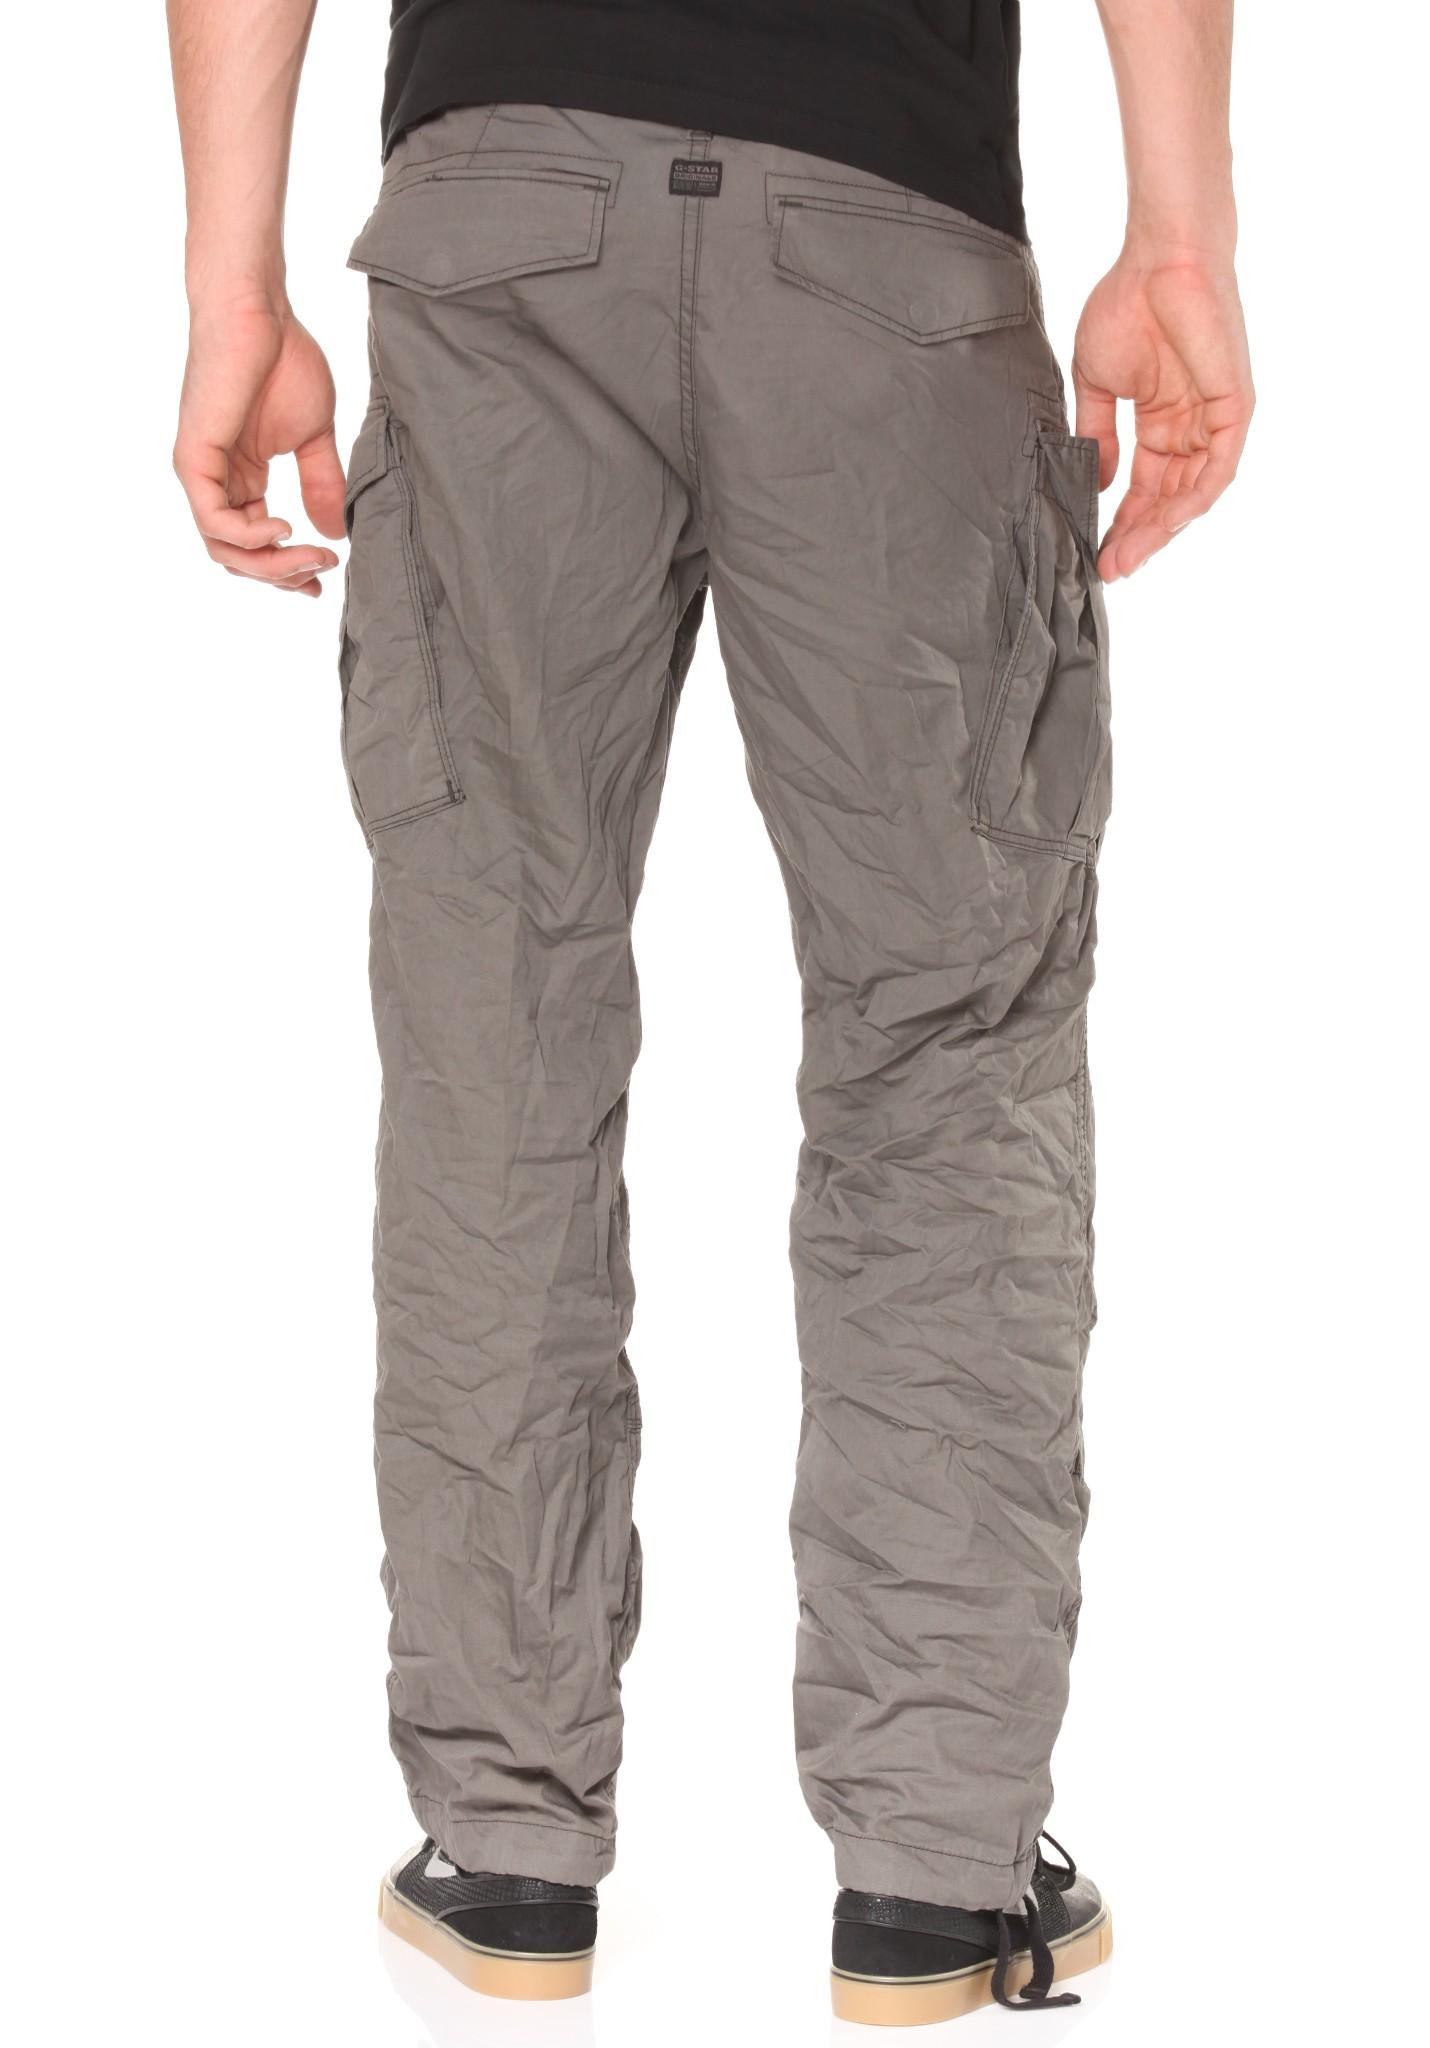 neu g star rovic belt lse premium twill herren jeans hose. Black Bedroom Furniture Sets. Home Design Ideas